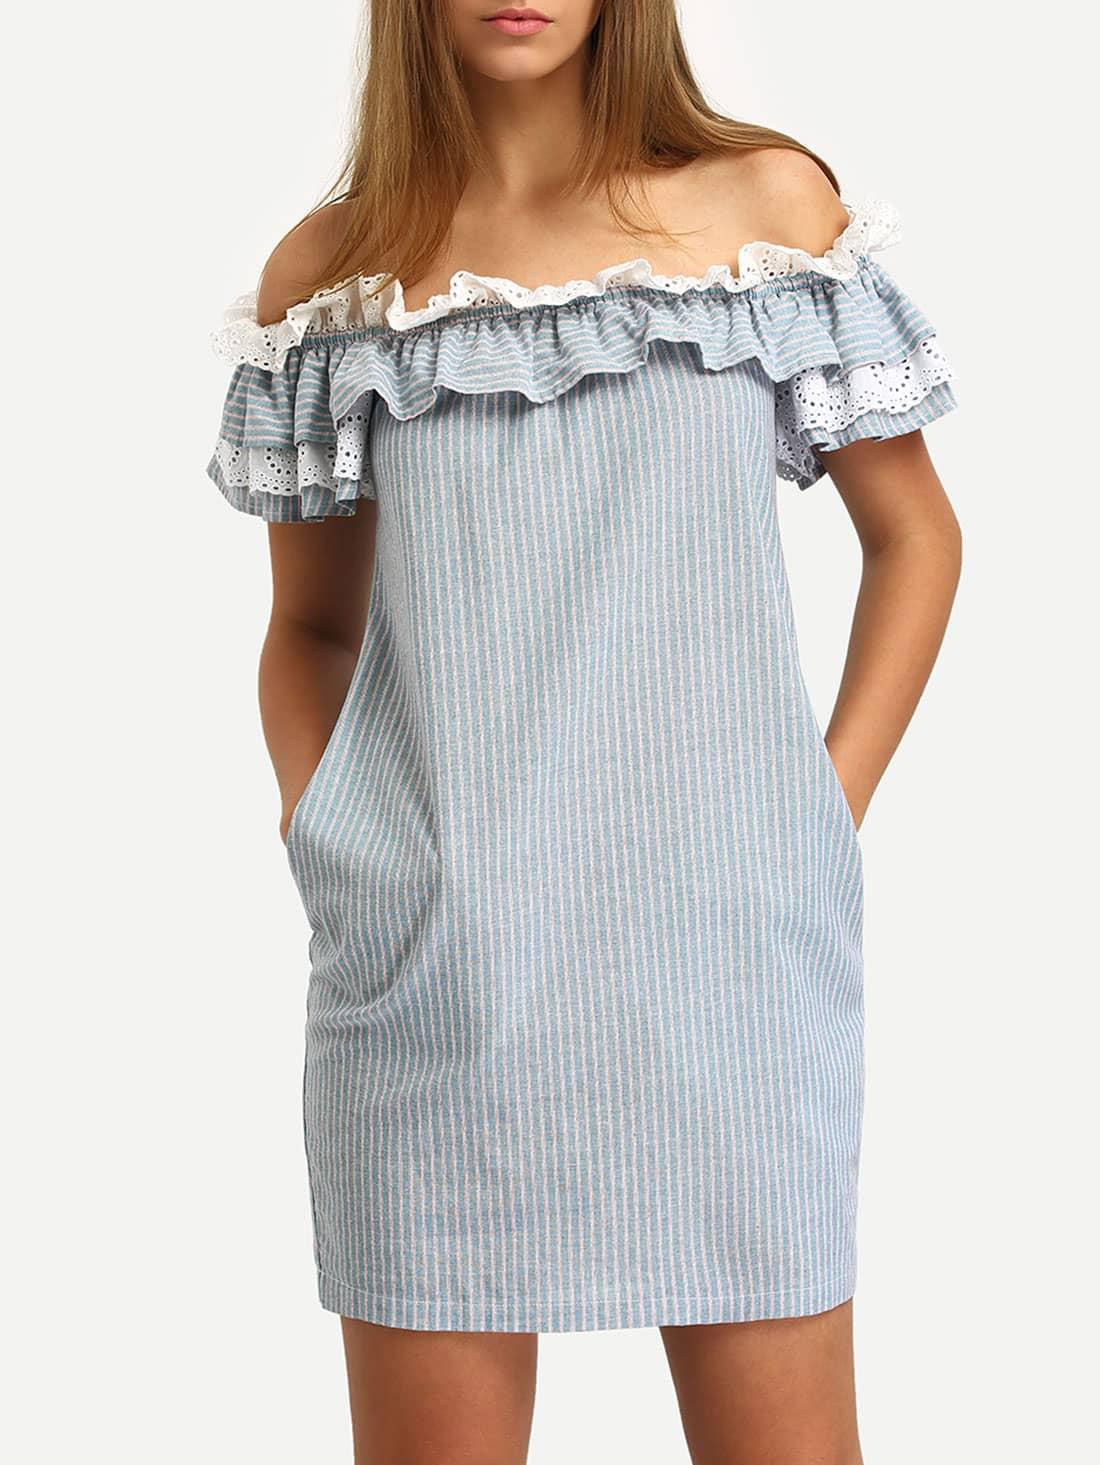 Blue Off The Shoulder Flounce Striped Pockets Dress dress160401501